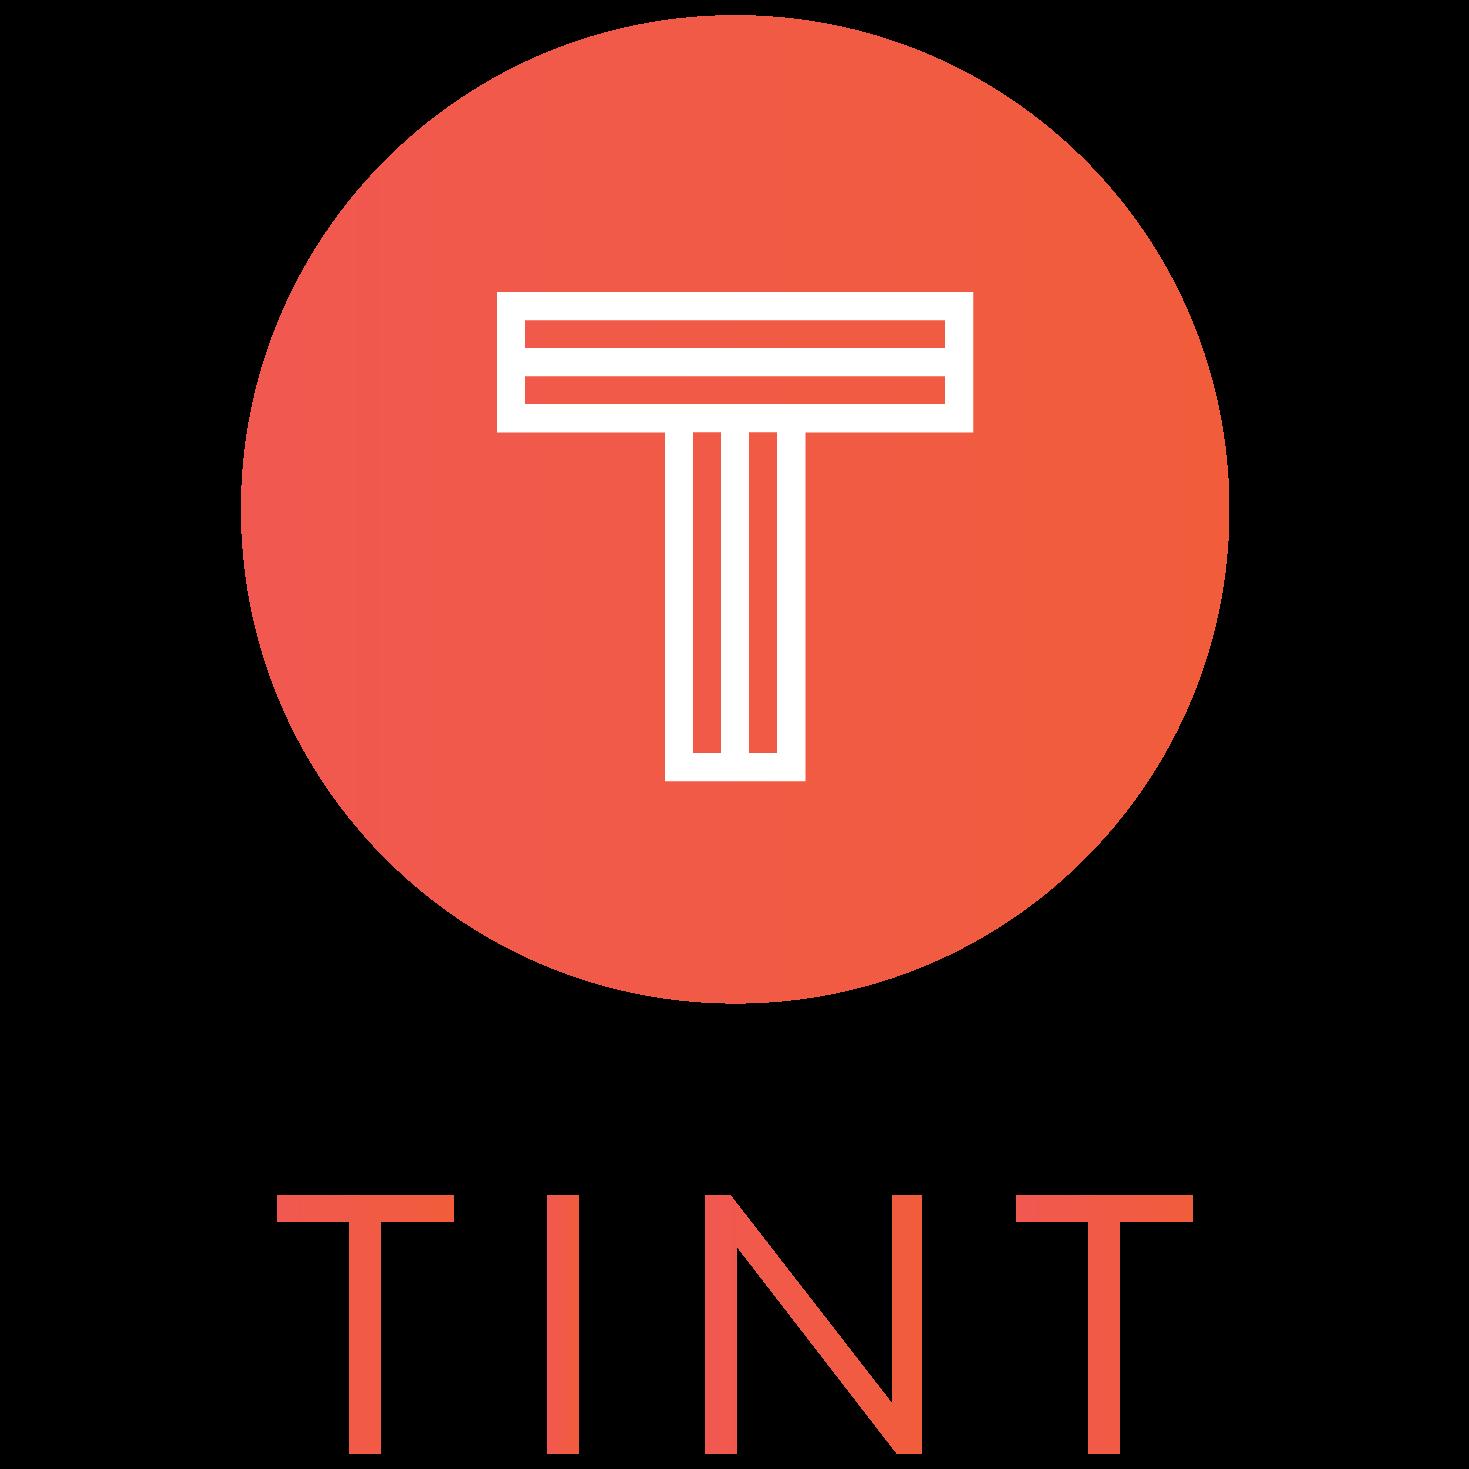 TINT by Filestack logo